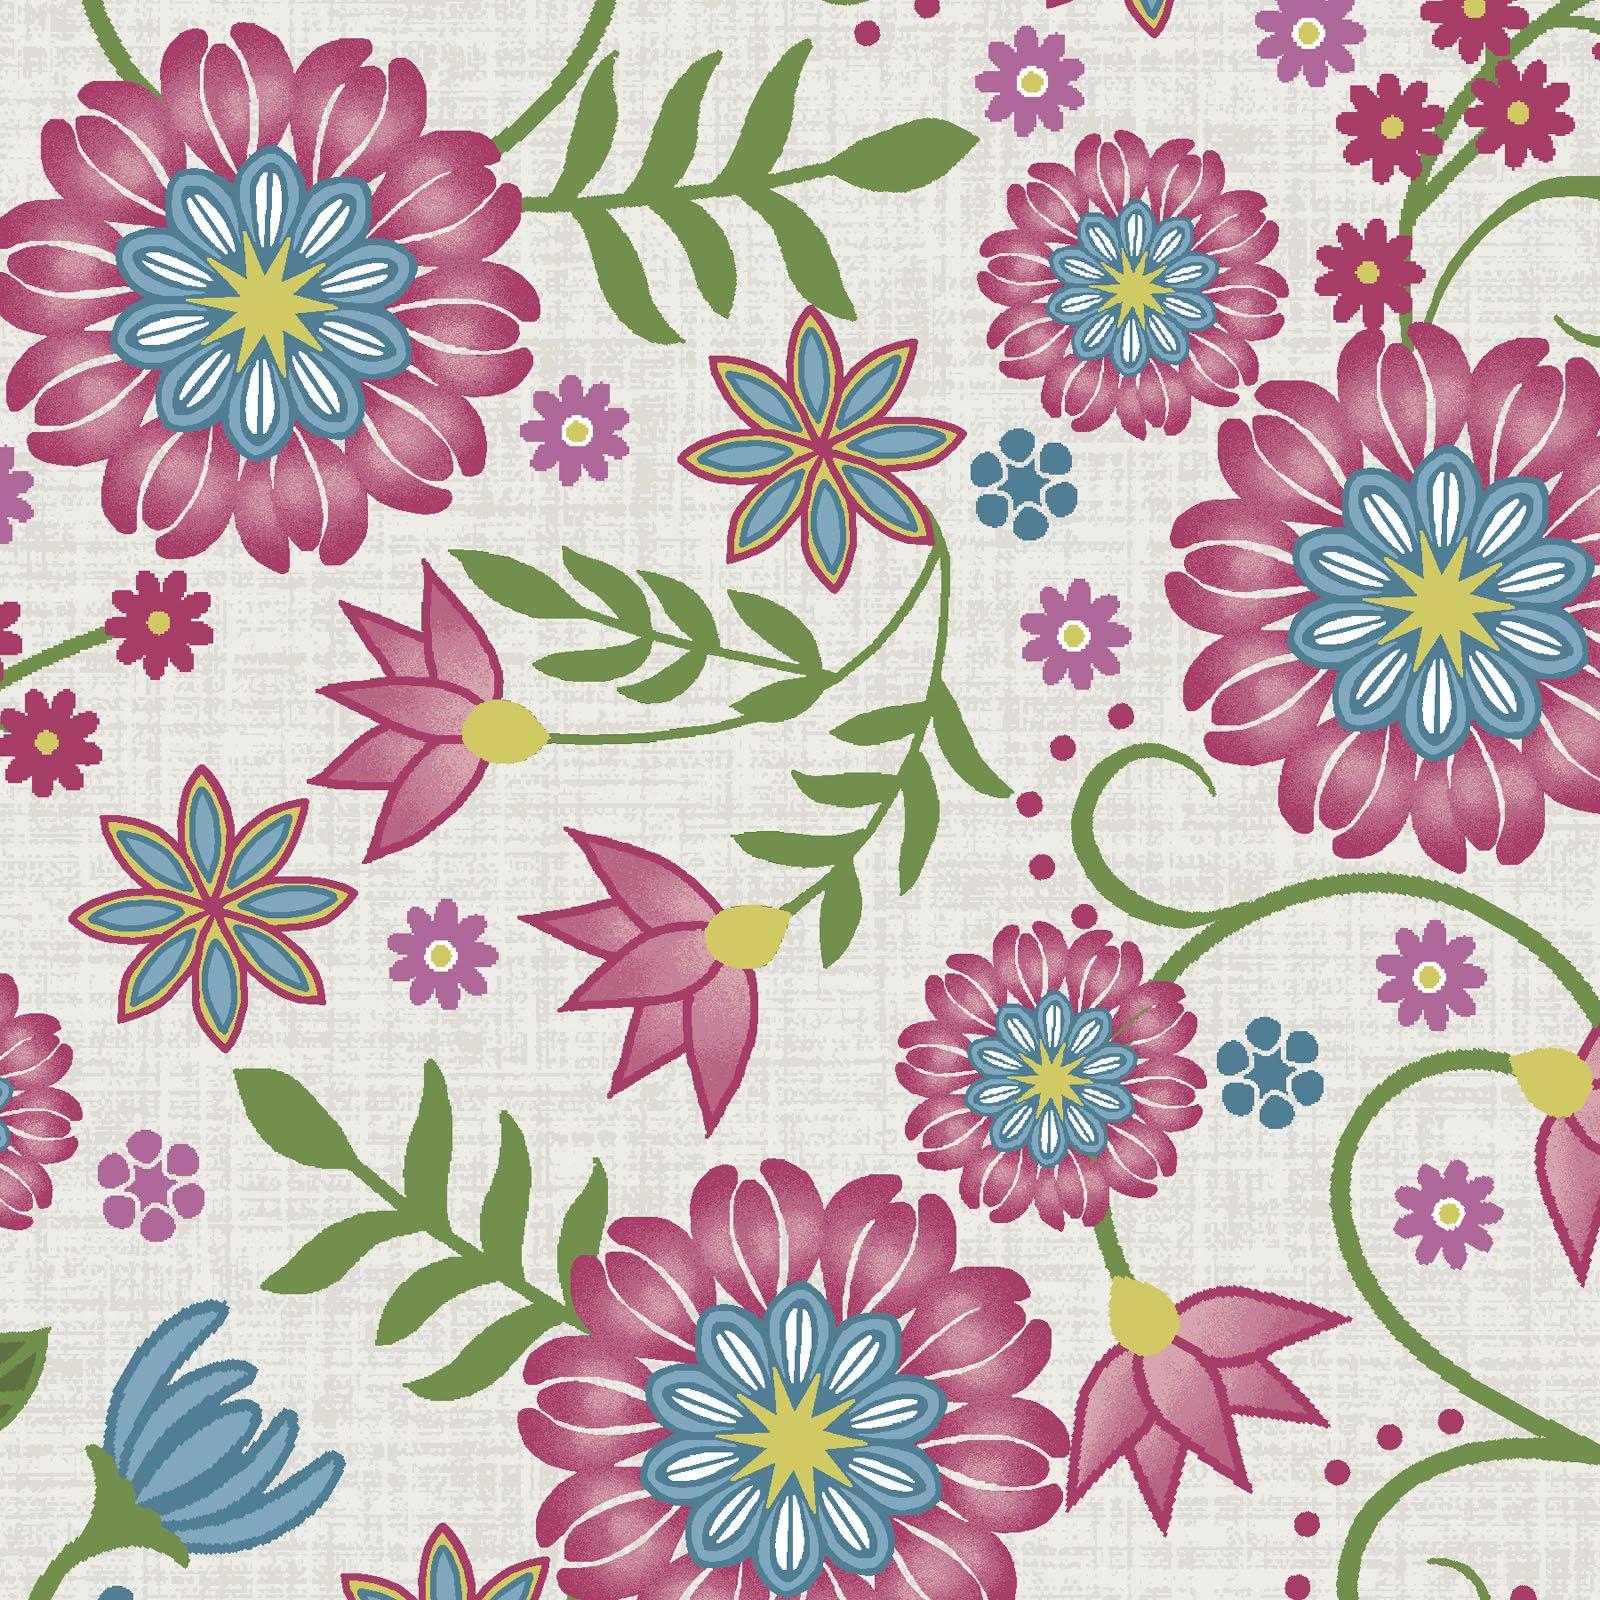 EESC-9880 E - FLOWER & VINE BY MONIQUE JACOBS FLOWER & VINE CREAM - AVAILABLE TO ORDER